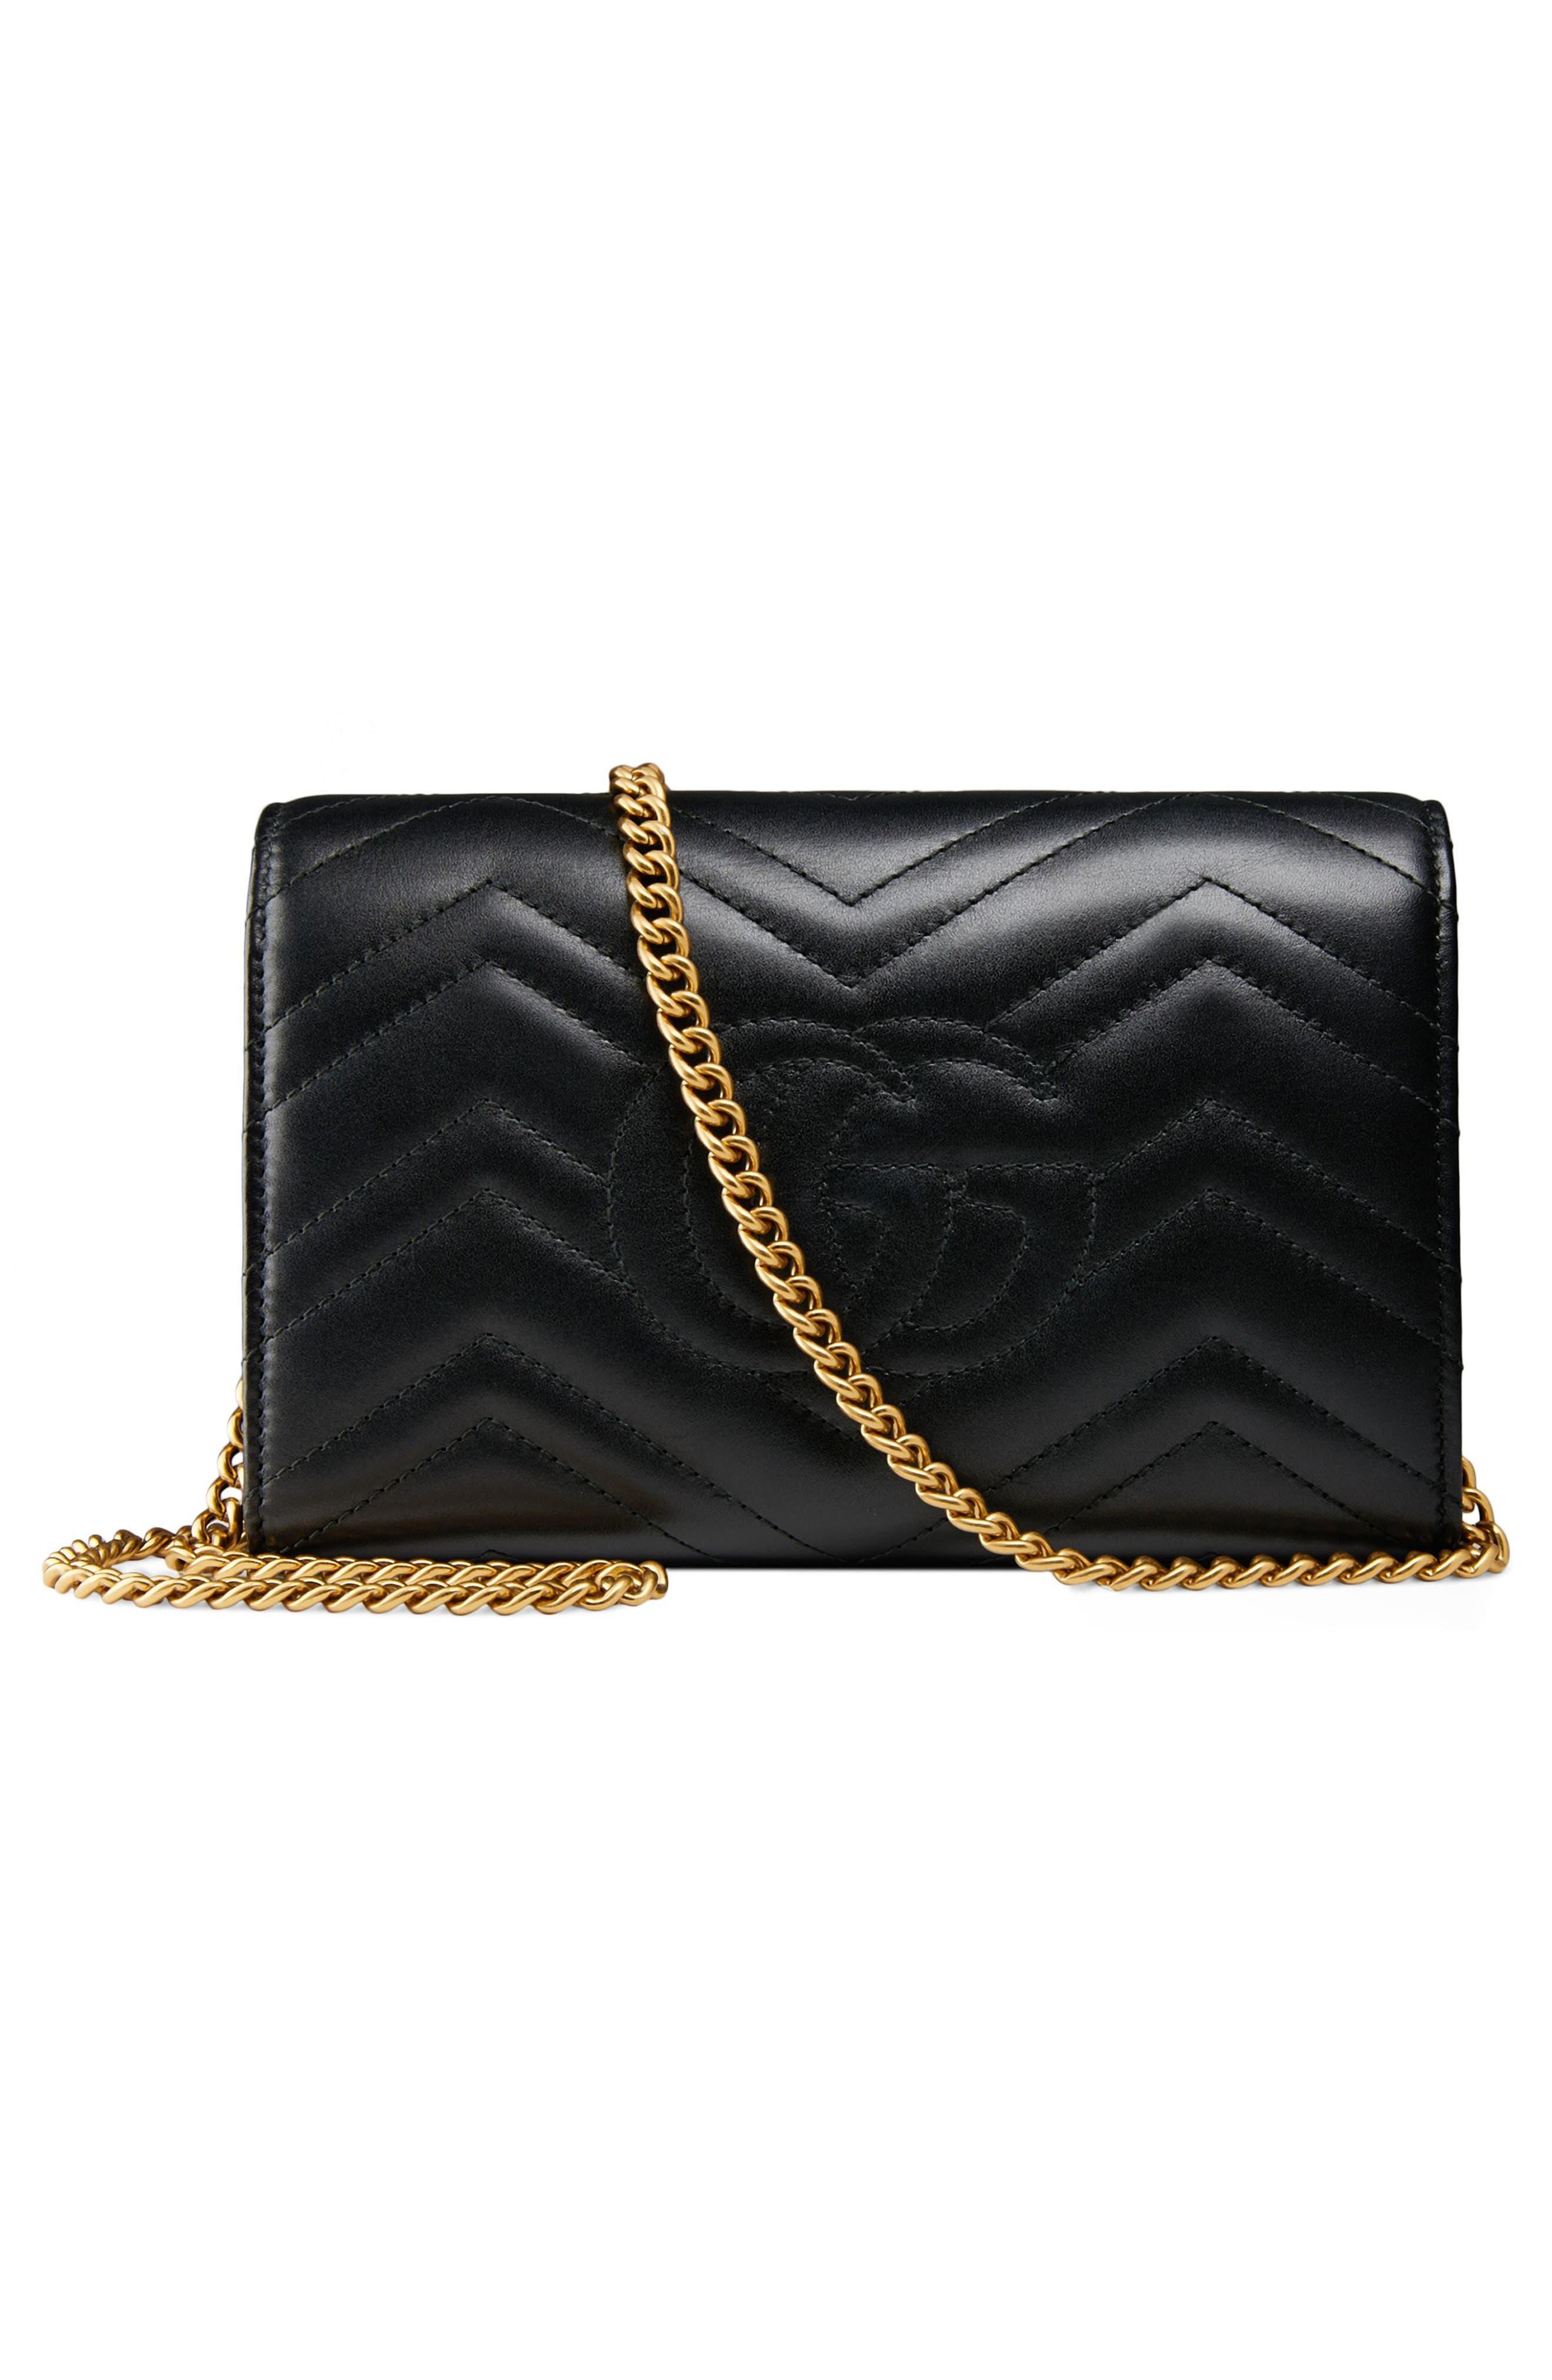 GUCCI, GG Marmont Matelassé Leather Wallet on a Chain, Alternate thumbnail 3, color, NERO